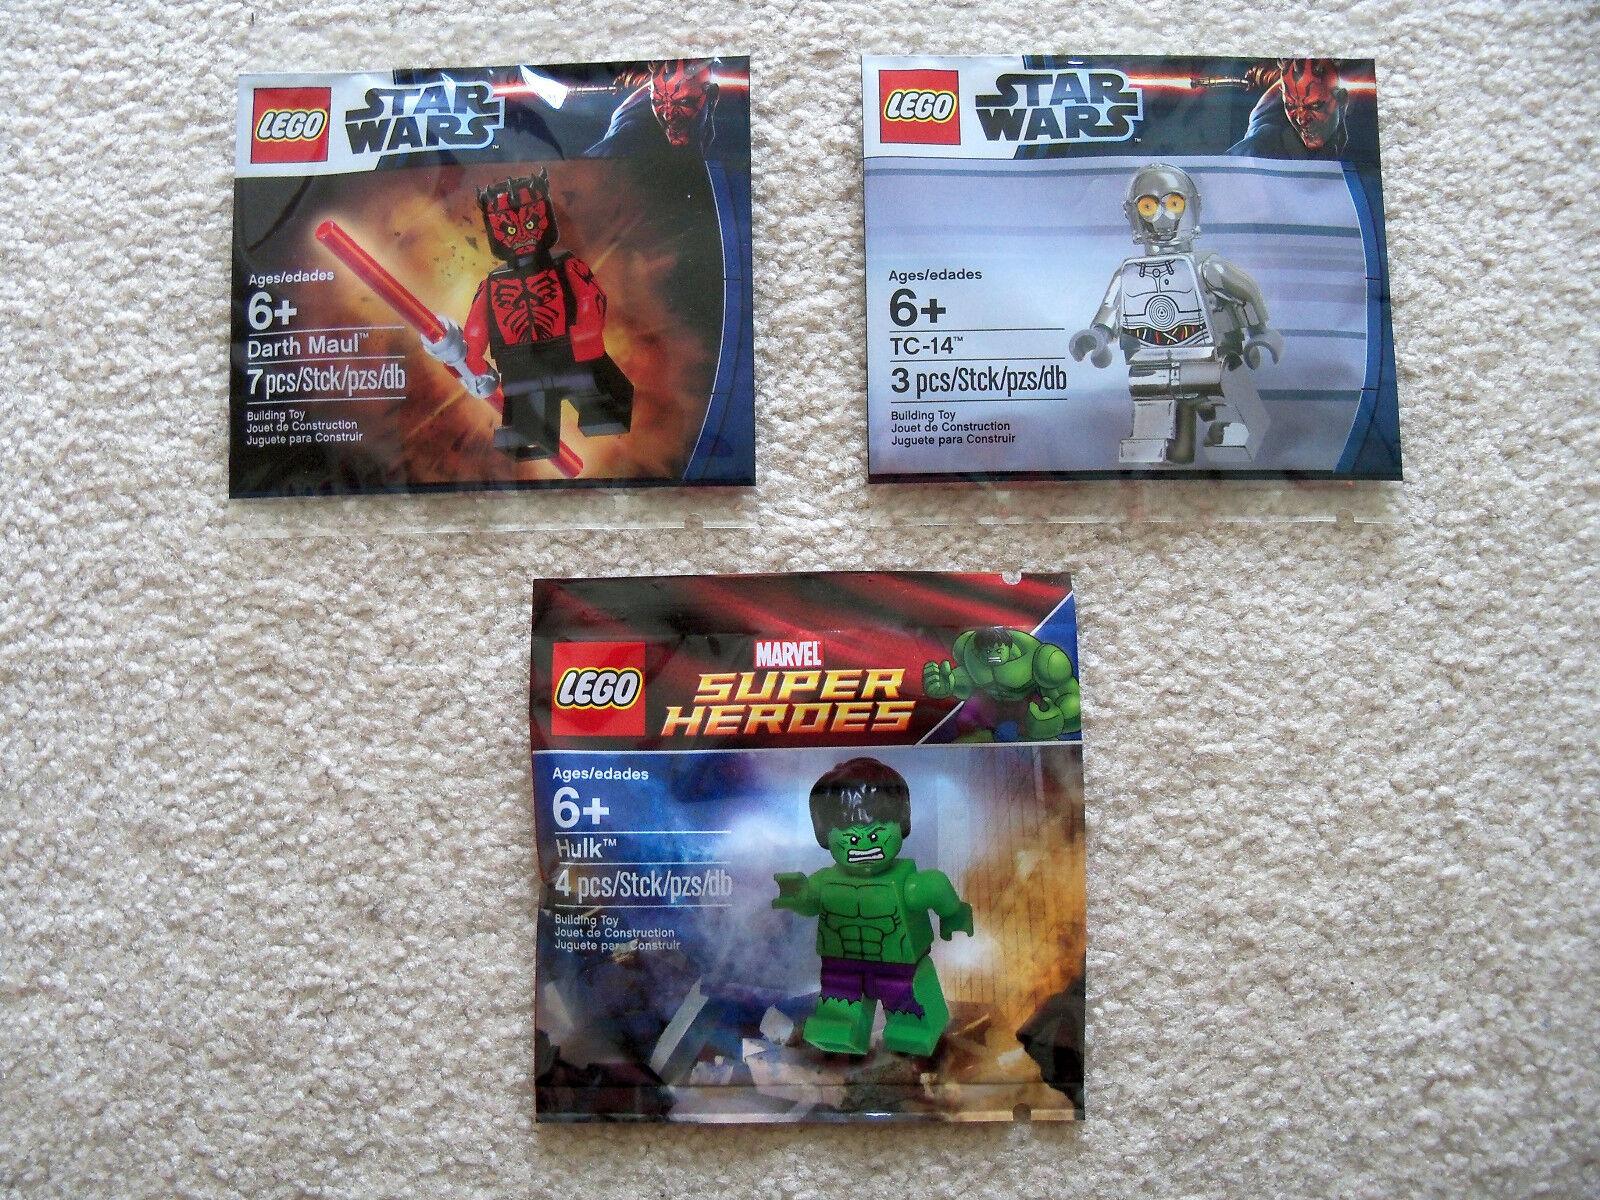 LEGO Star Wars - Darth Maul 5000062 TC-14 5000063 & Hulk 5000022 - New & Sealed